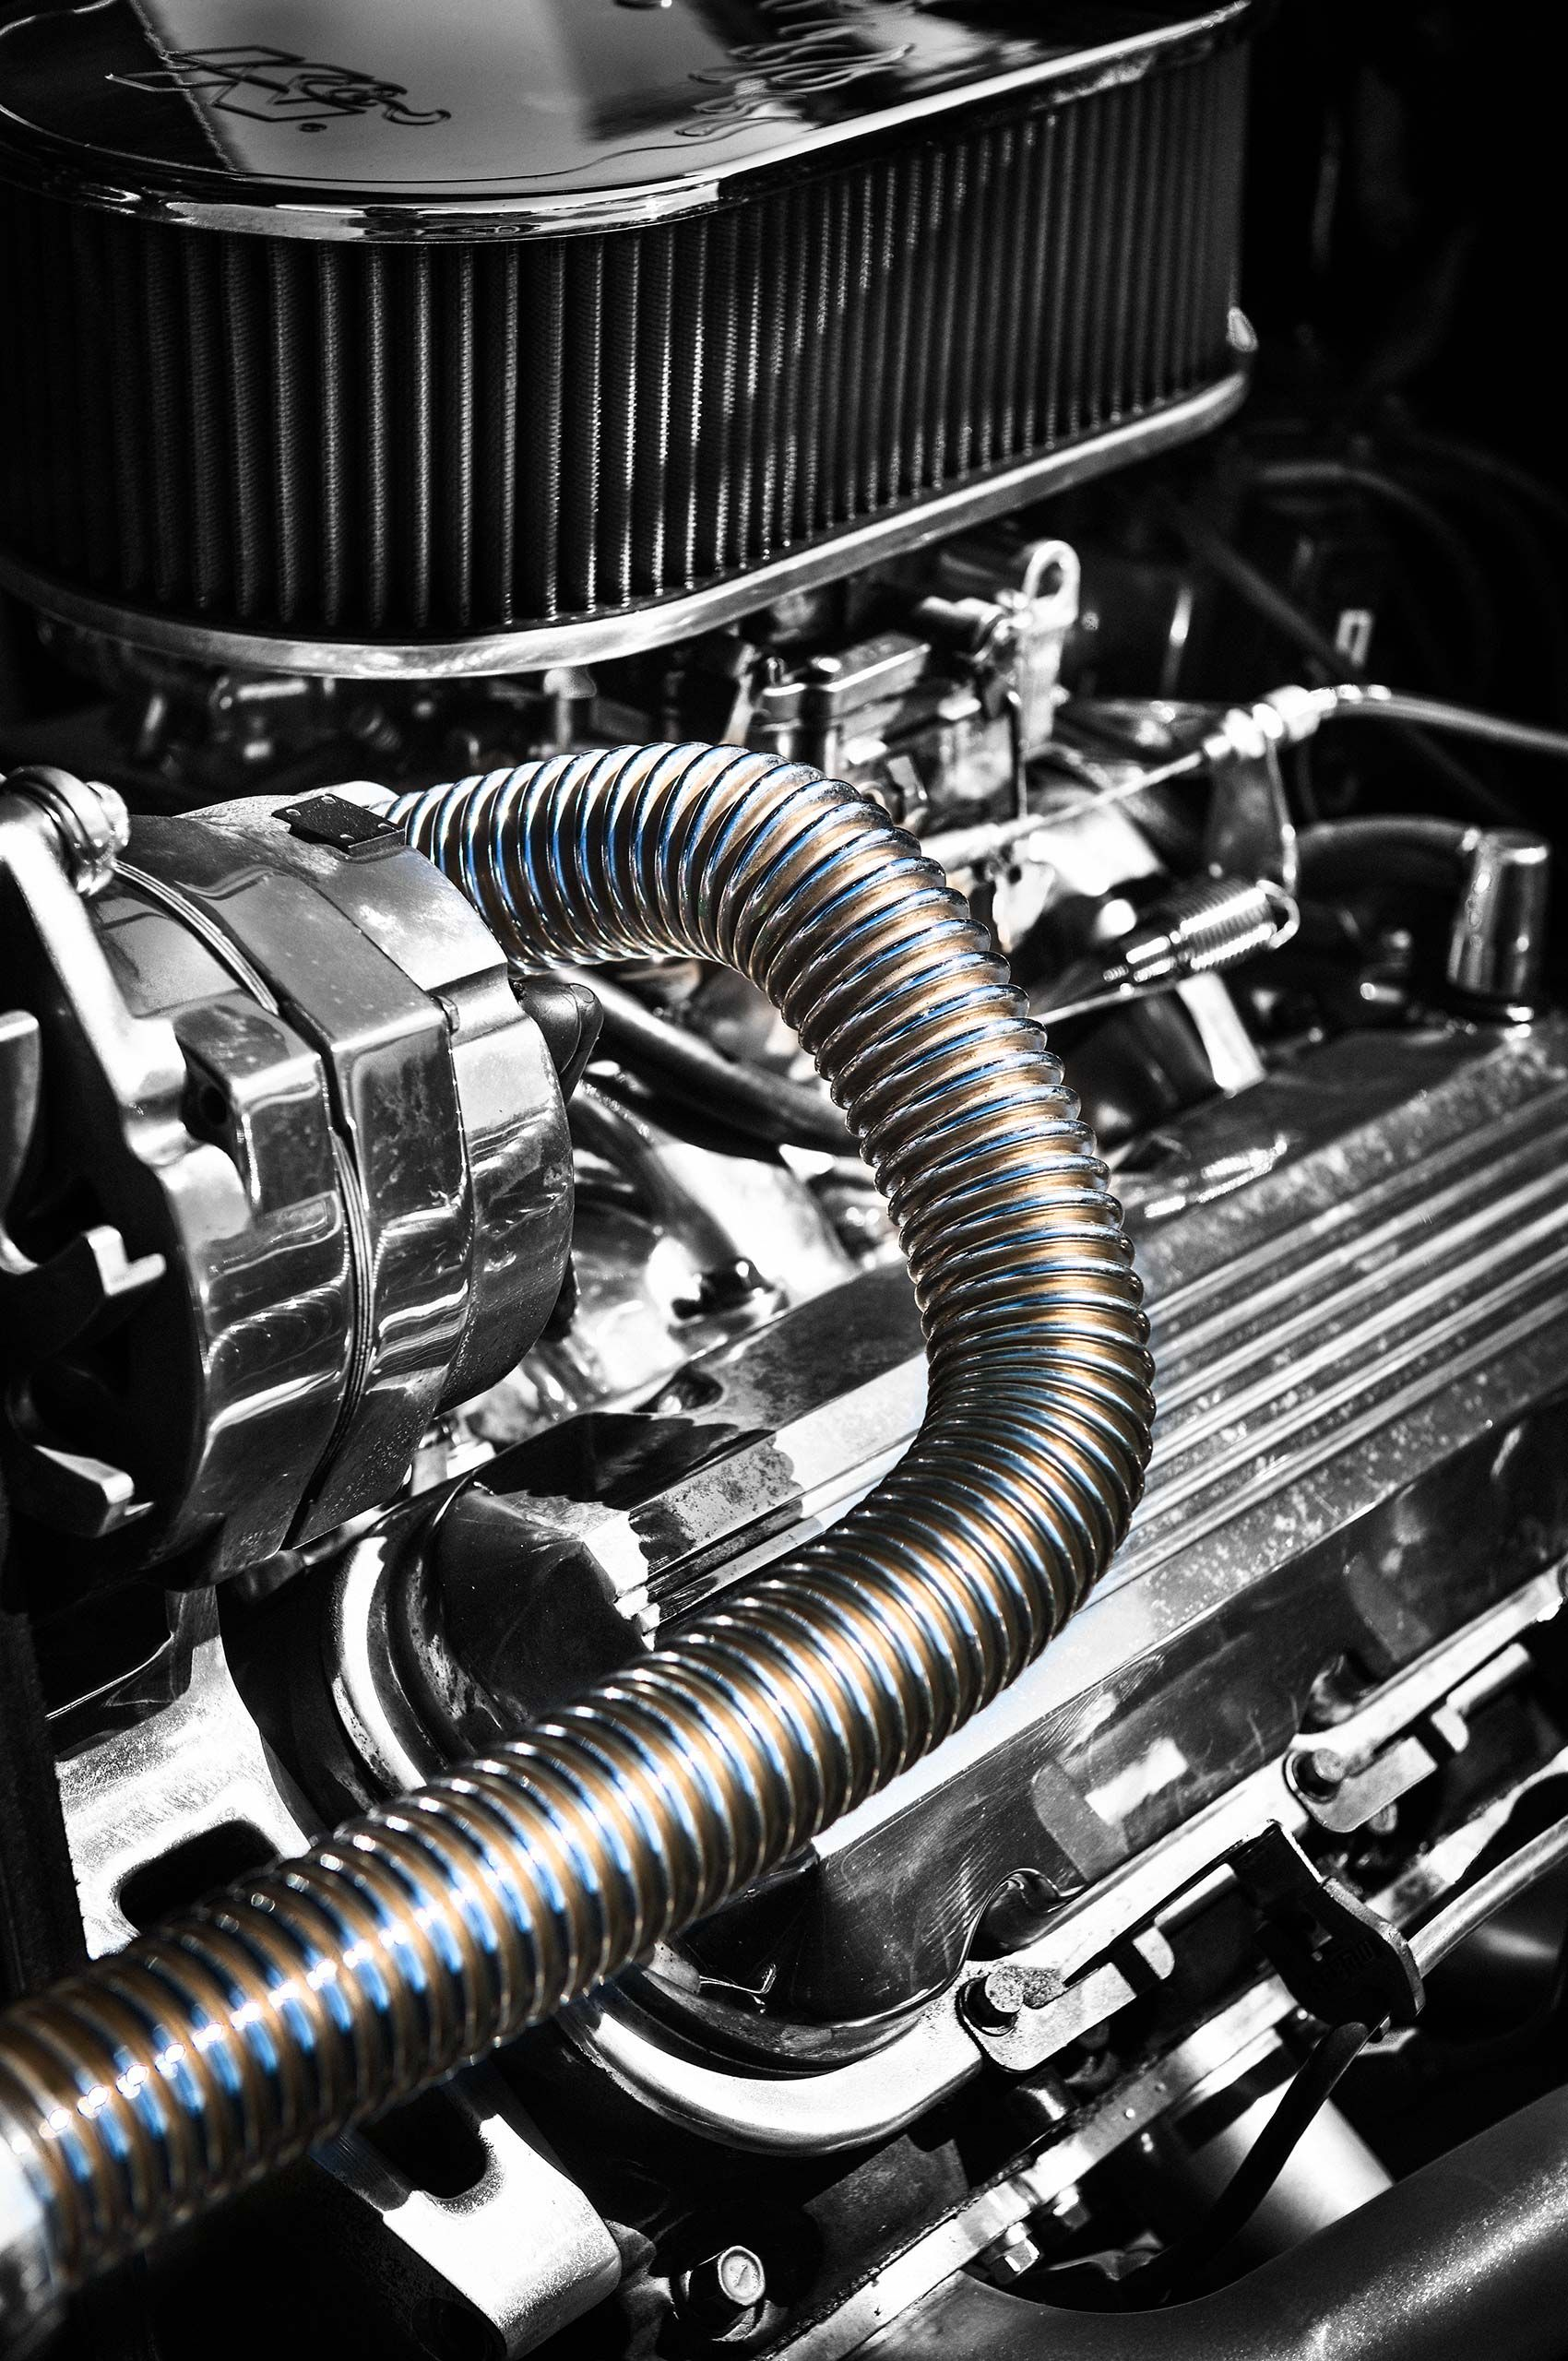 classic-motor-vivalasvegas-HenrikOlundPhotography.jpg